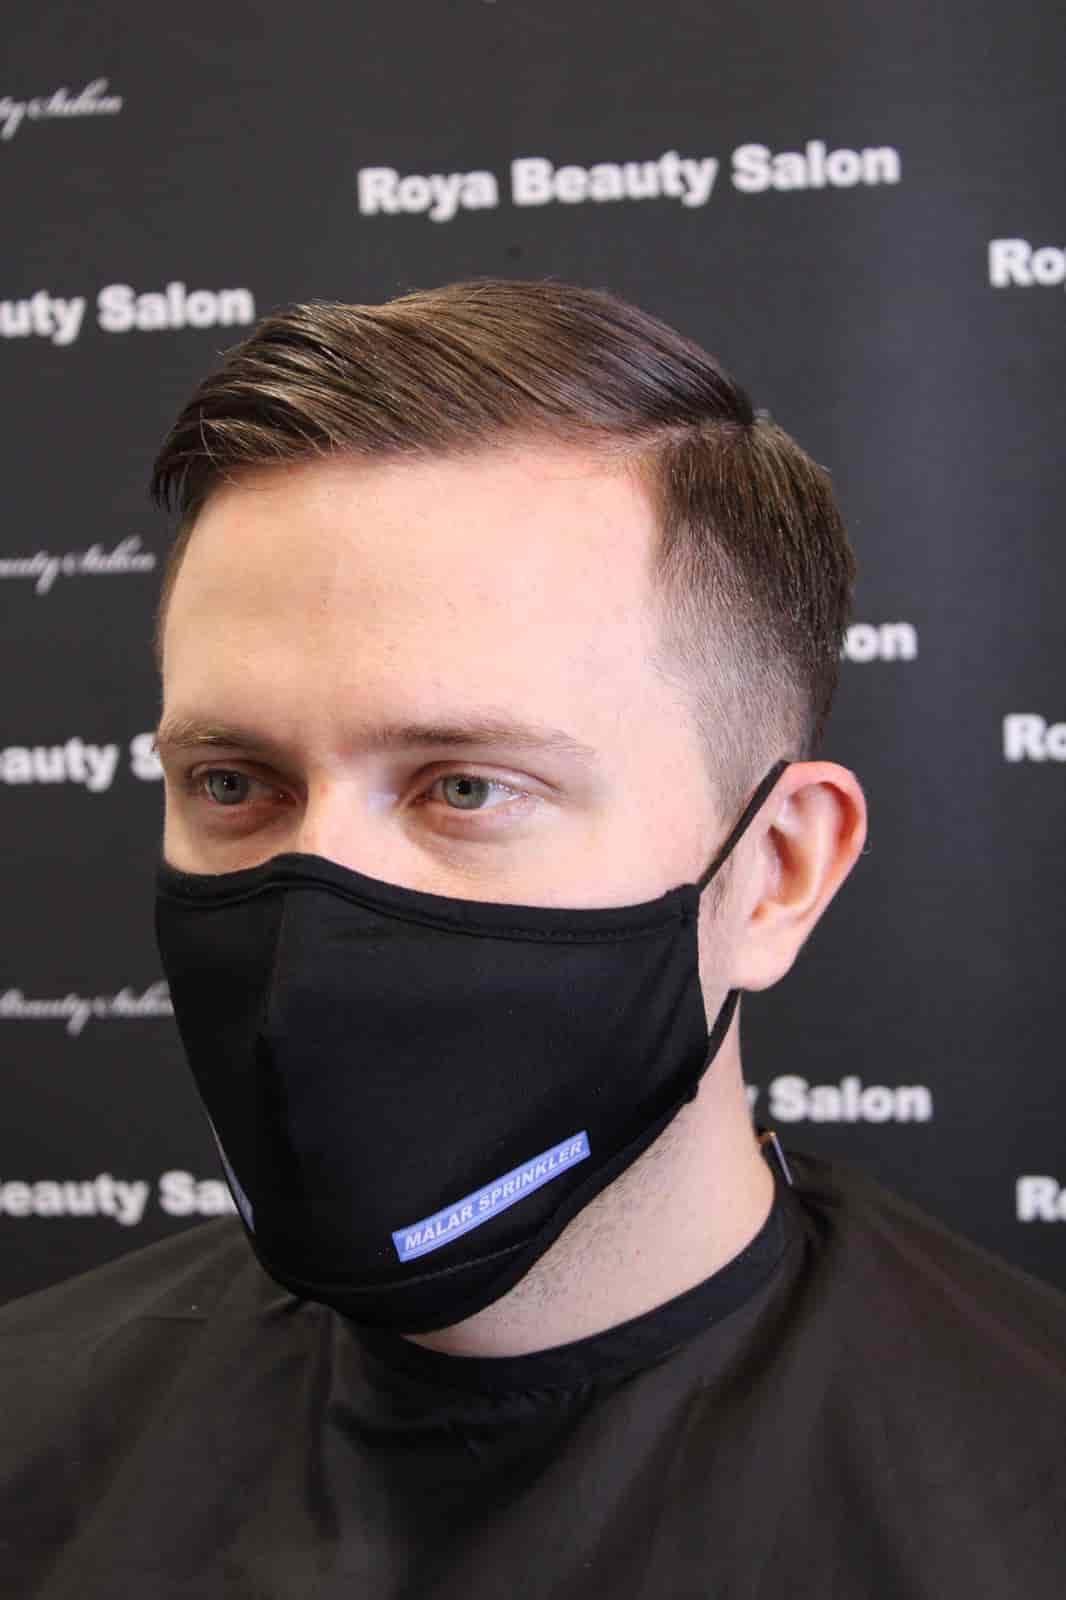 Fade-22-Roya-Beauty-Salon